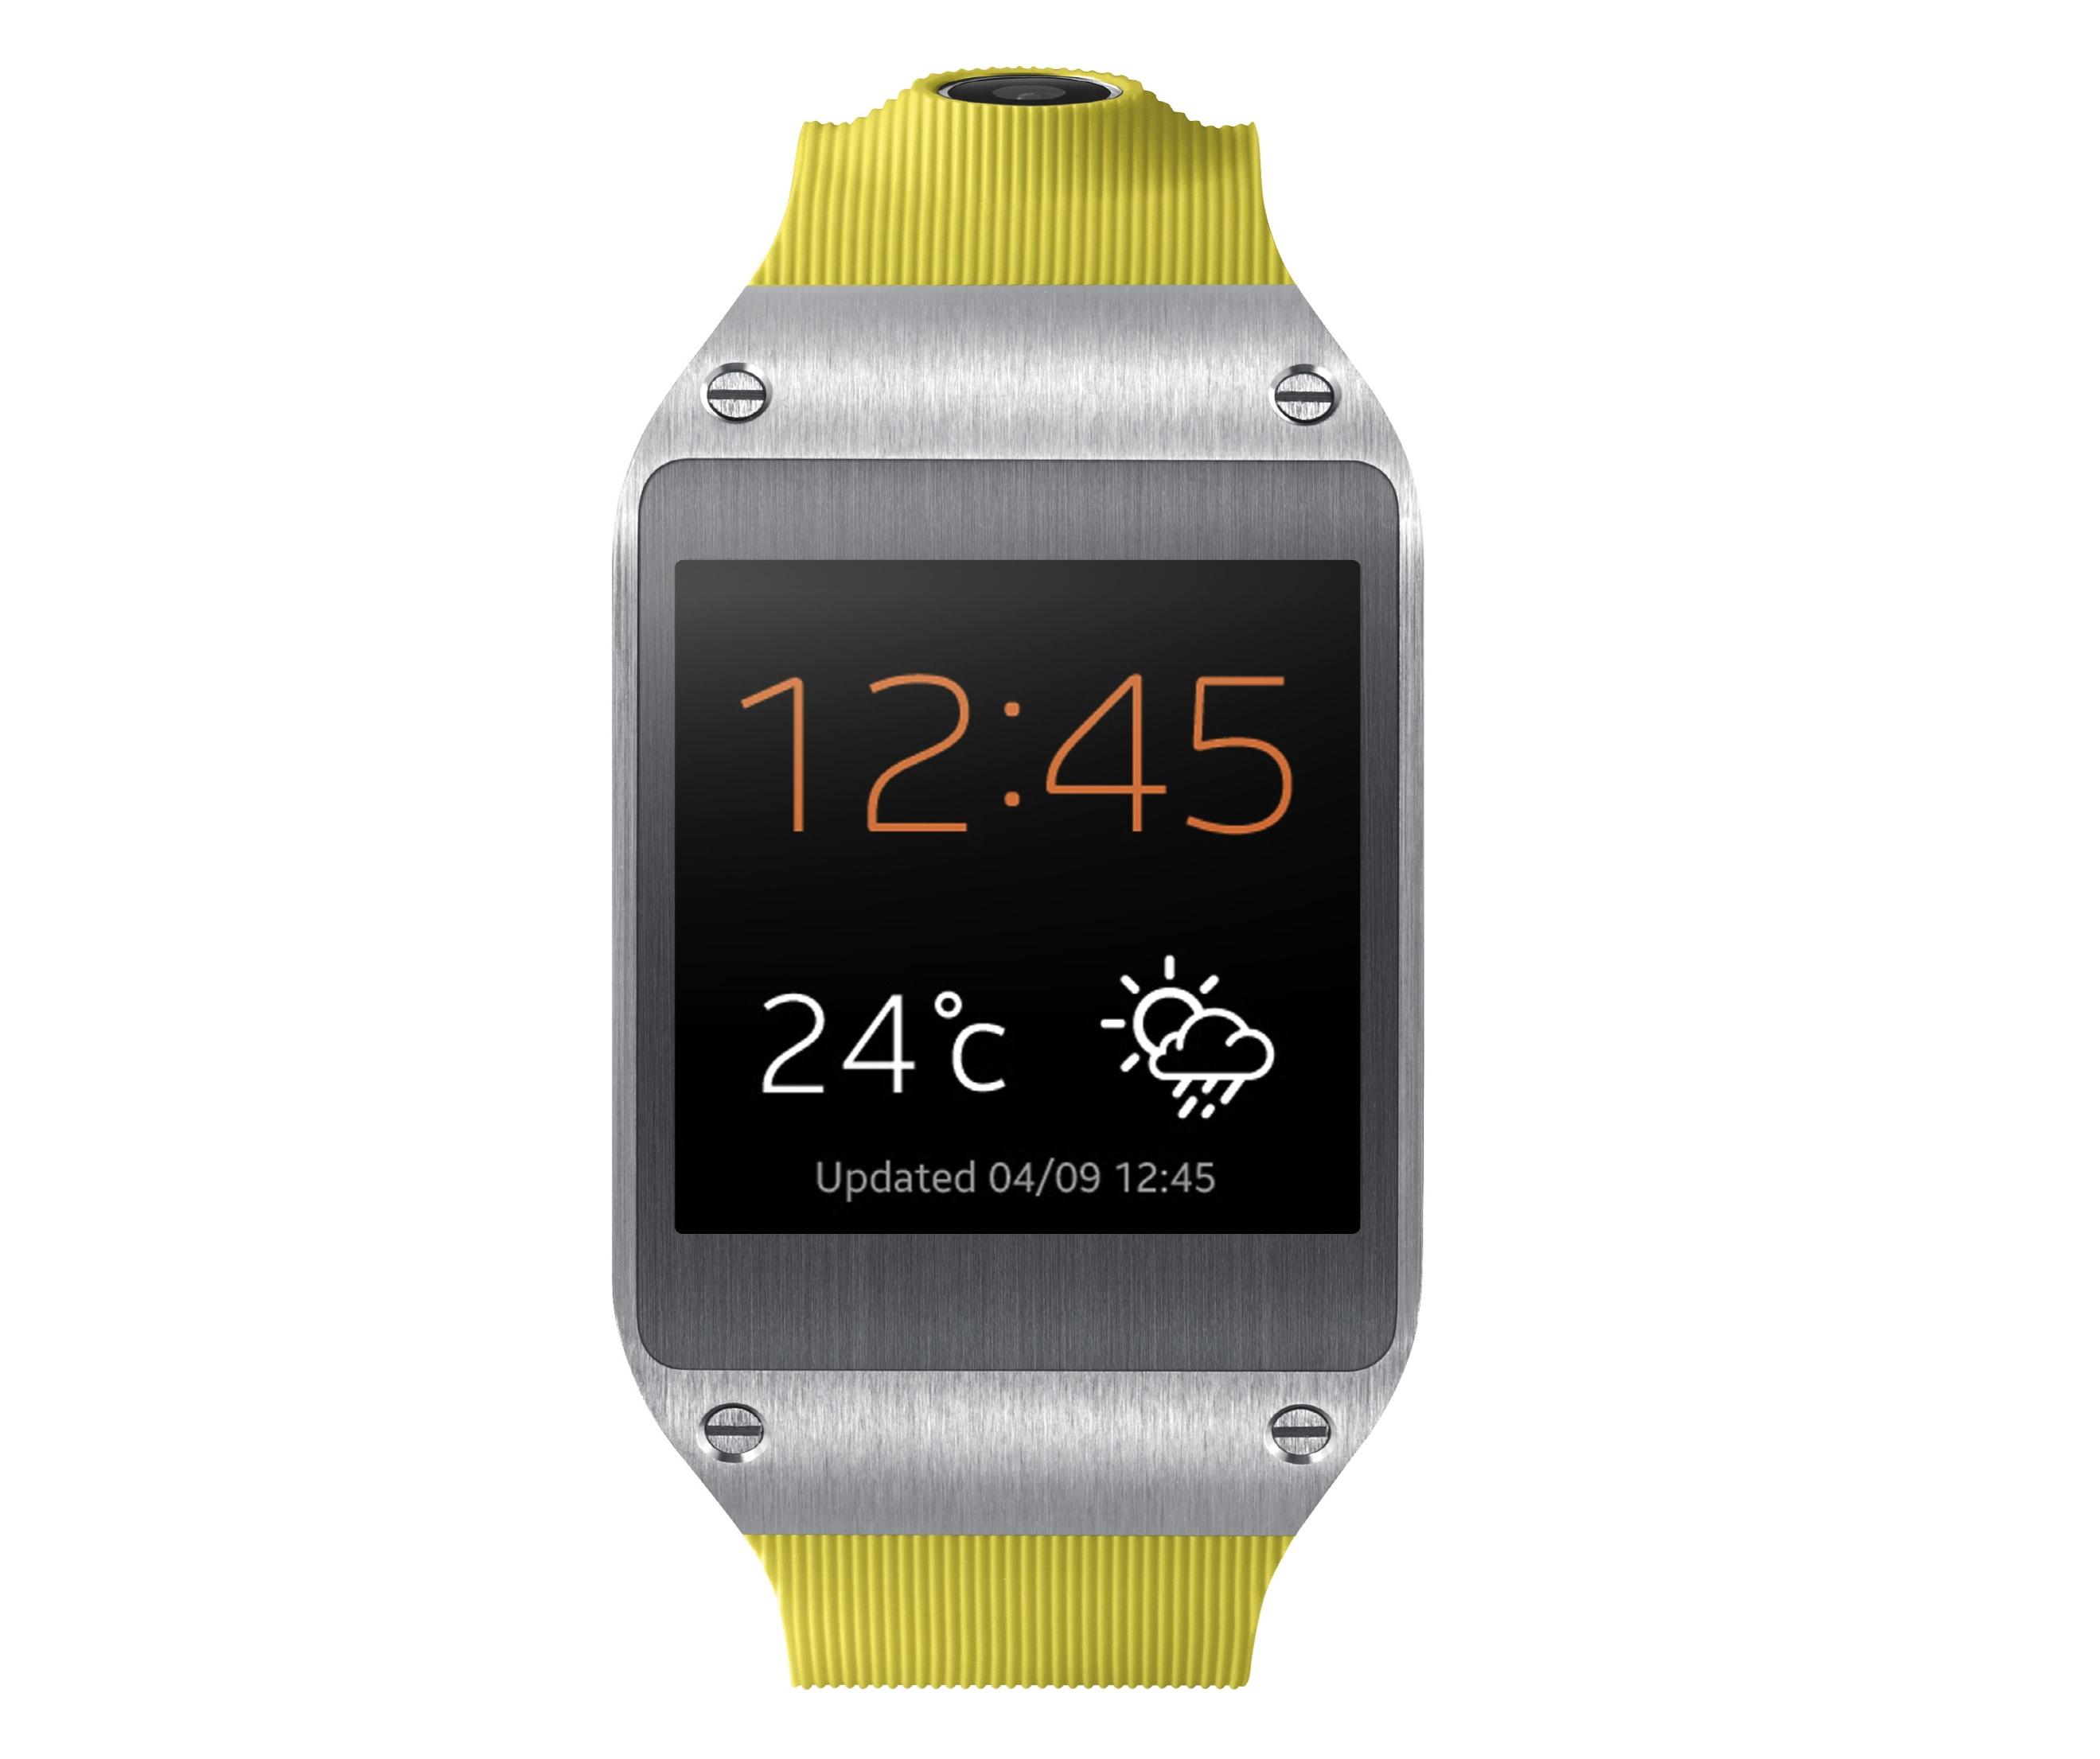 Samsung Galaxy Gear Release Date